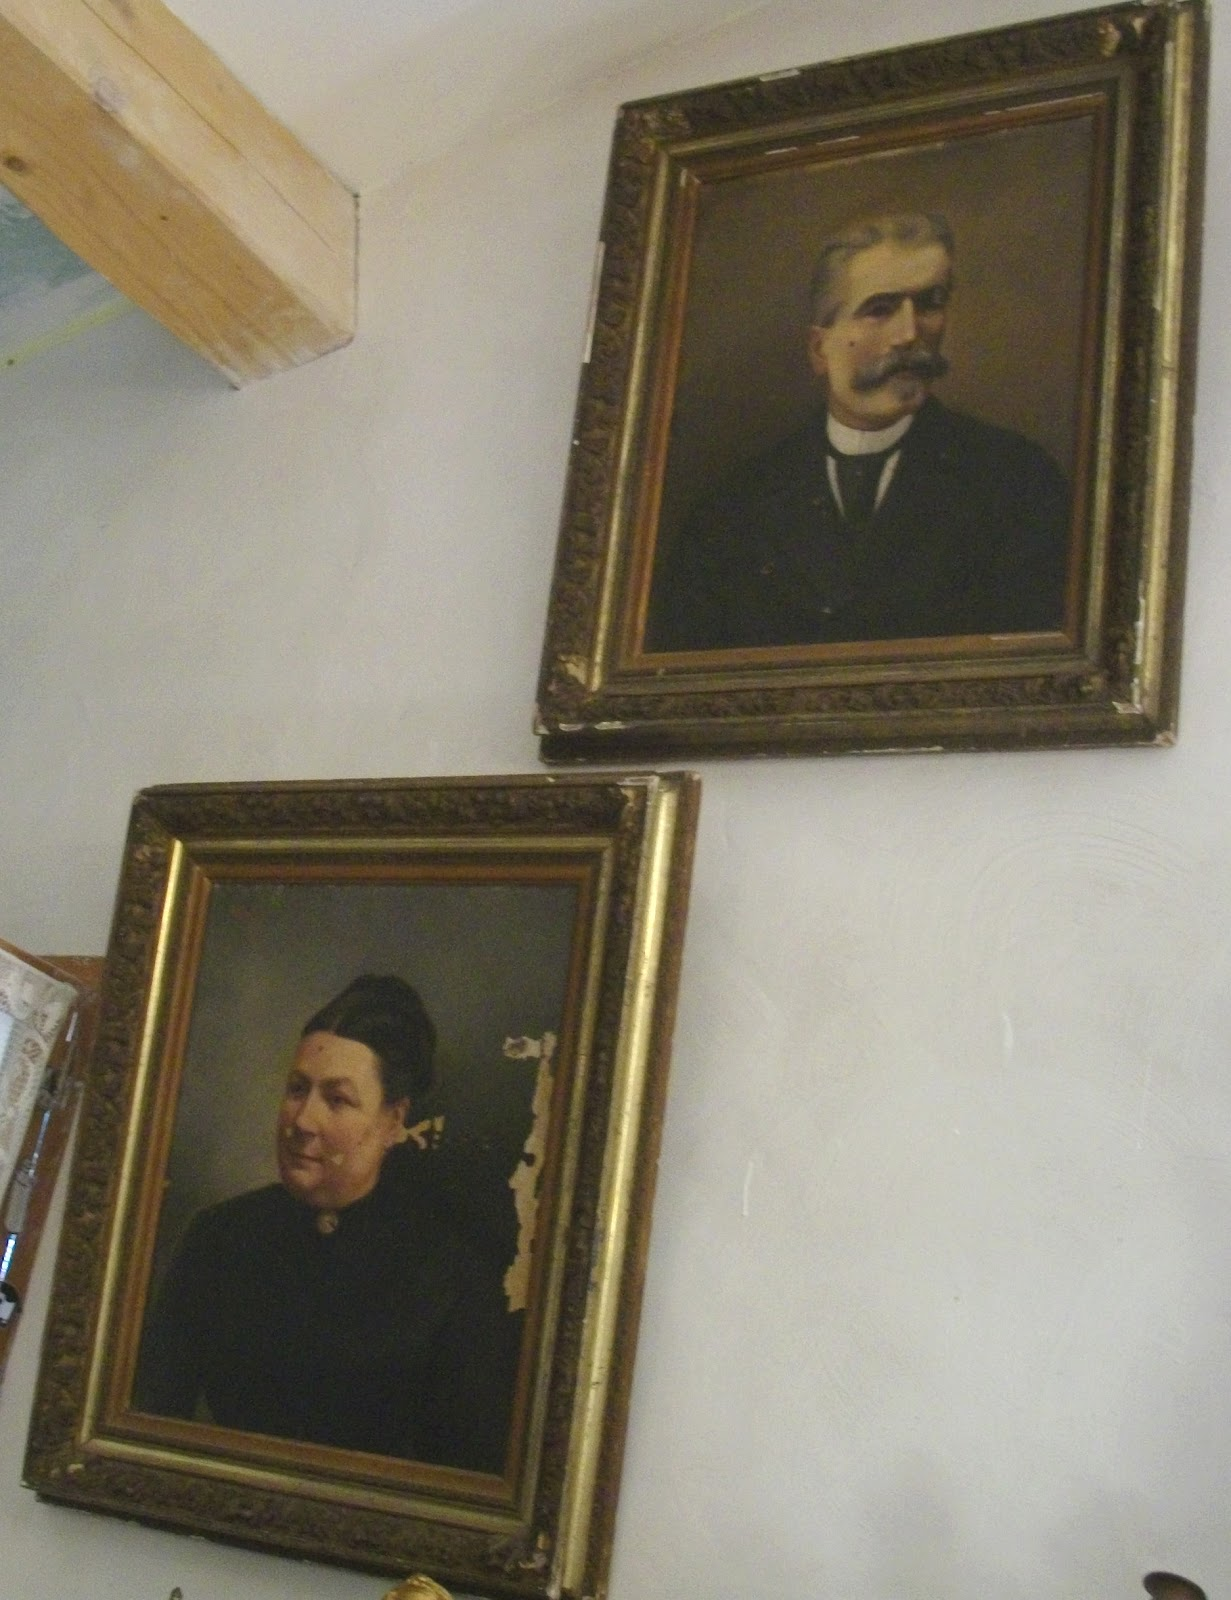 ancien tableau hst portrait dame noble sign valery huile sur toile. Black Bedroom Furniture Sets. Home Design Ideas